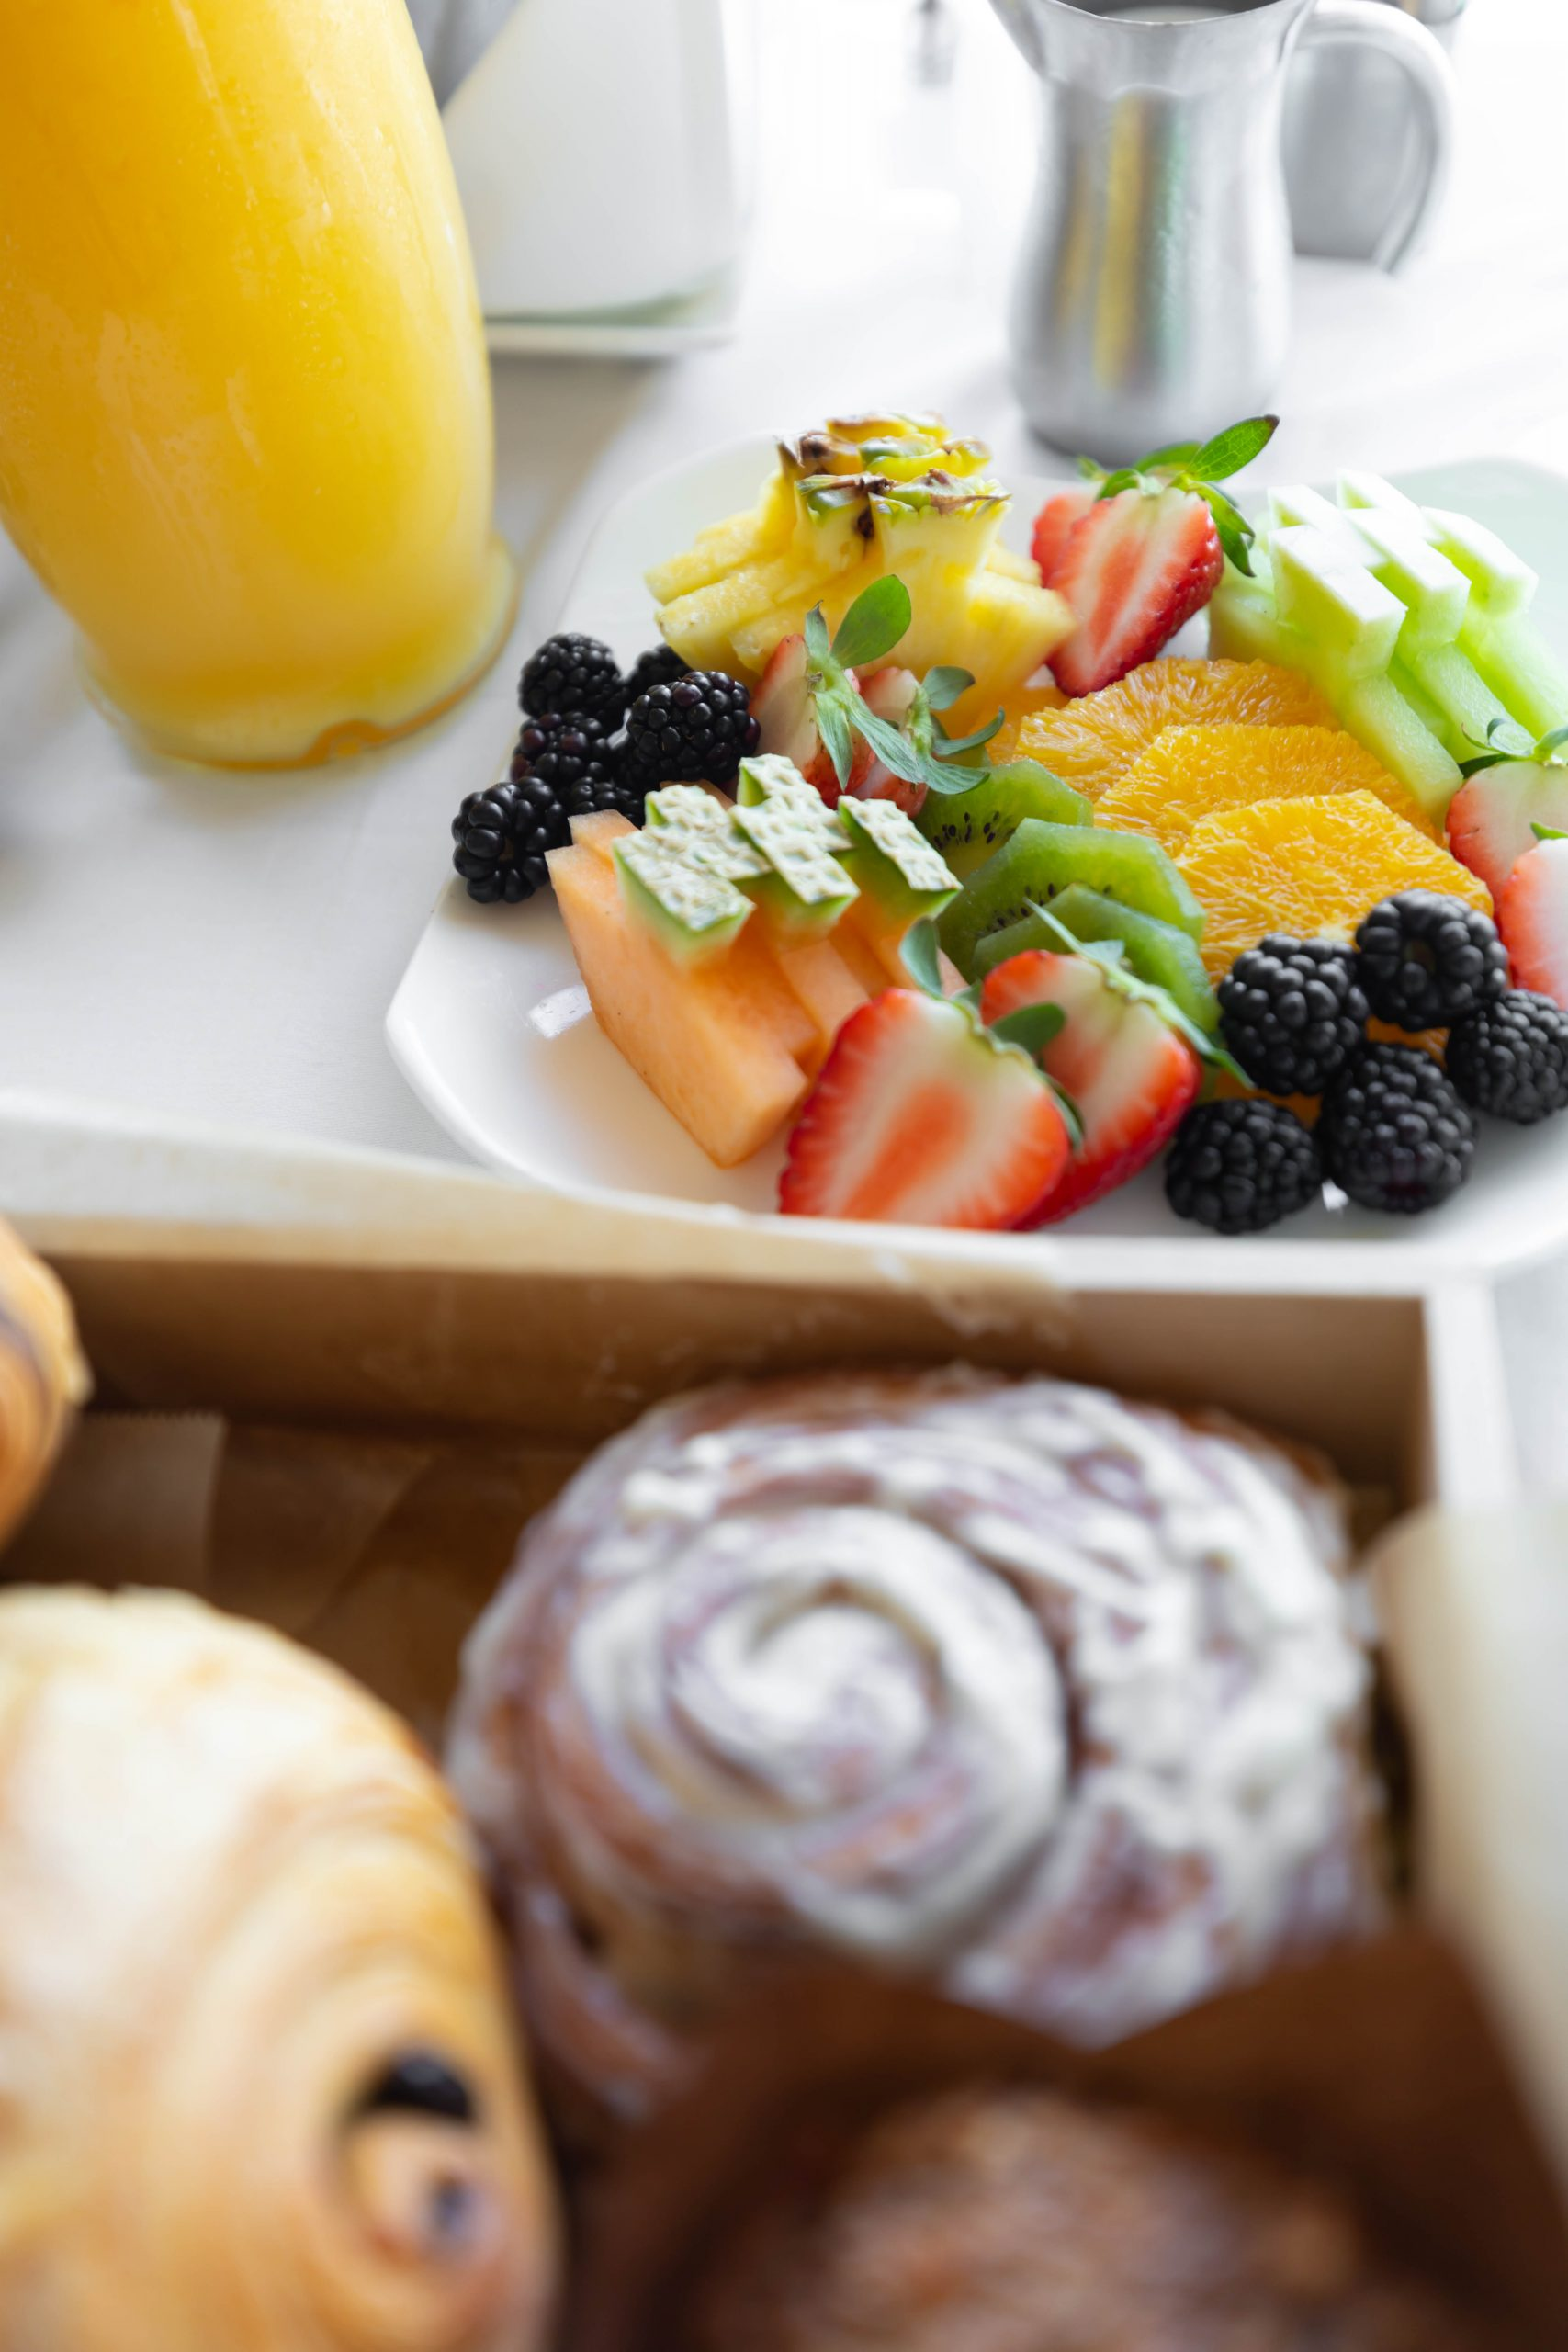 Engagement Celebration at Waldorf Astoria Orlando Fresh Fruit, Pastries, Champagne, and Brunch Room Service by Annie Fairfax